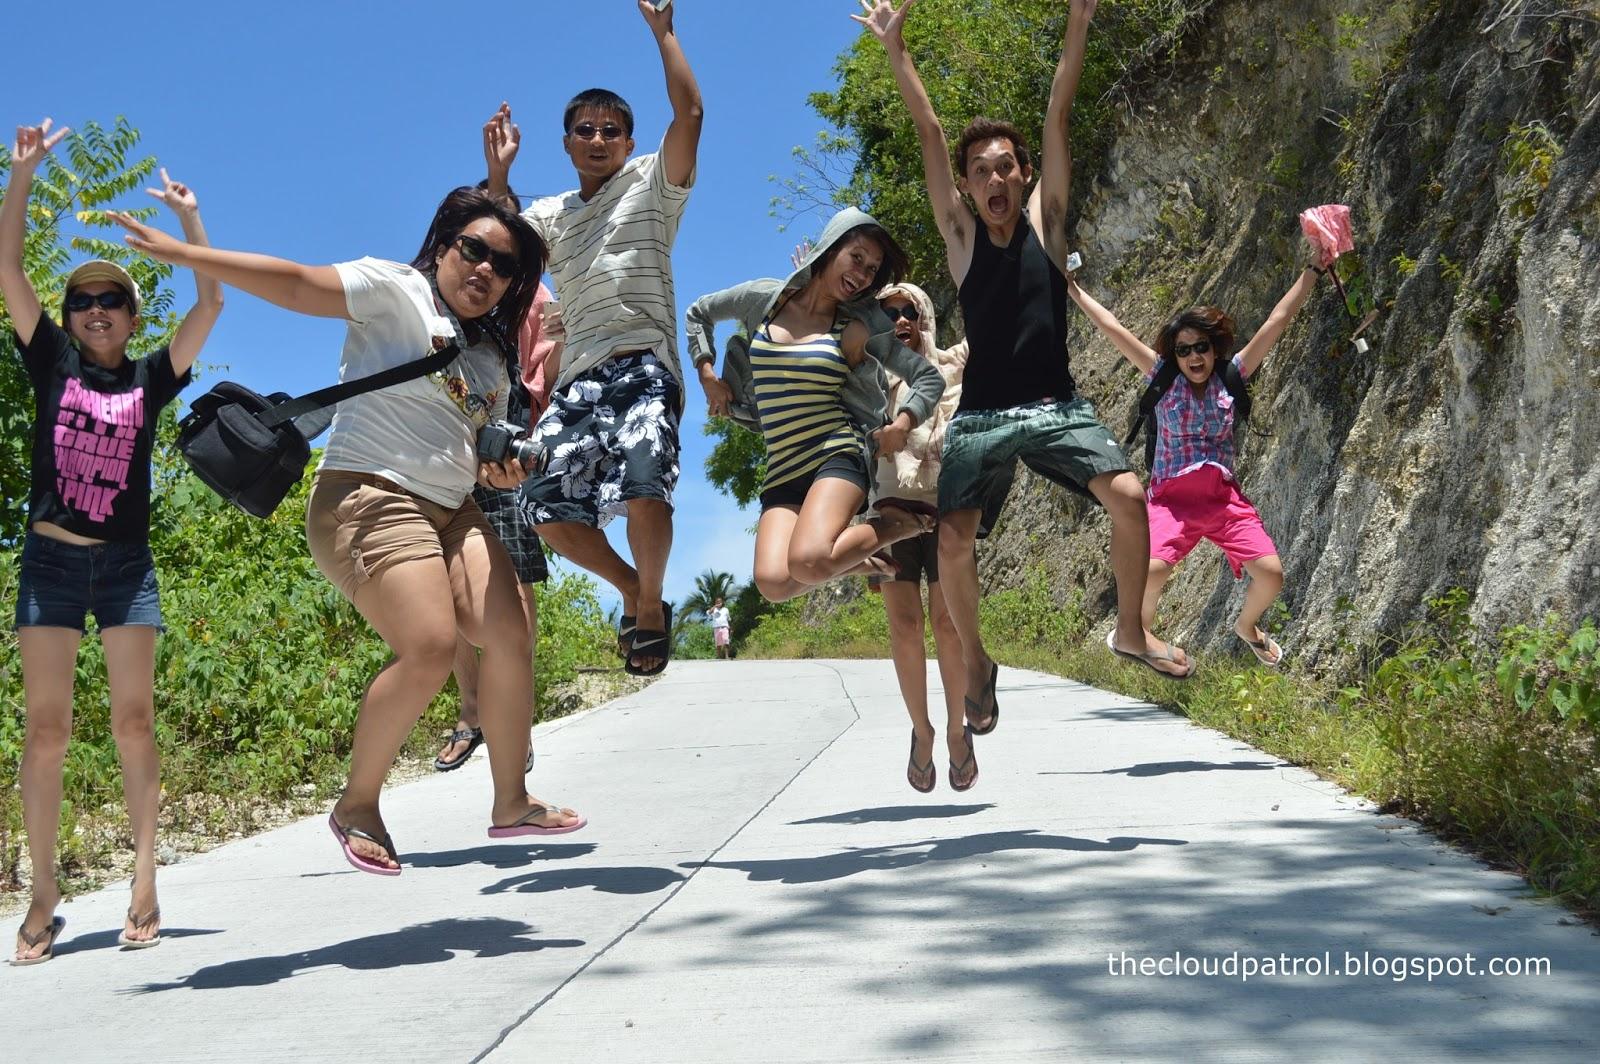 Butanding, whale shark, cebu, oslob, philippines, Tumalog, Waterfalls, mountain, hiking, hike, treking, trek, jumpshot, jup, shot, friends, barkada, trip,